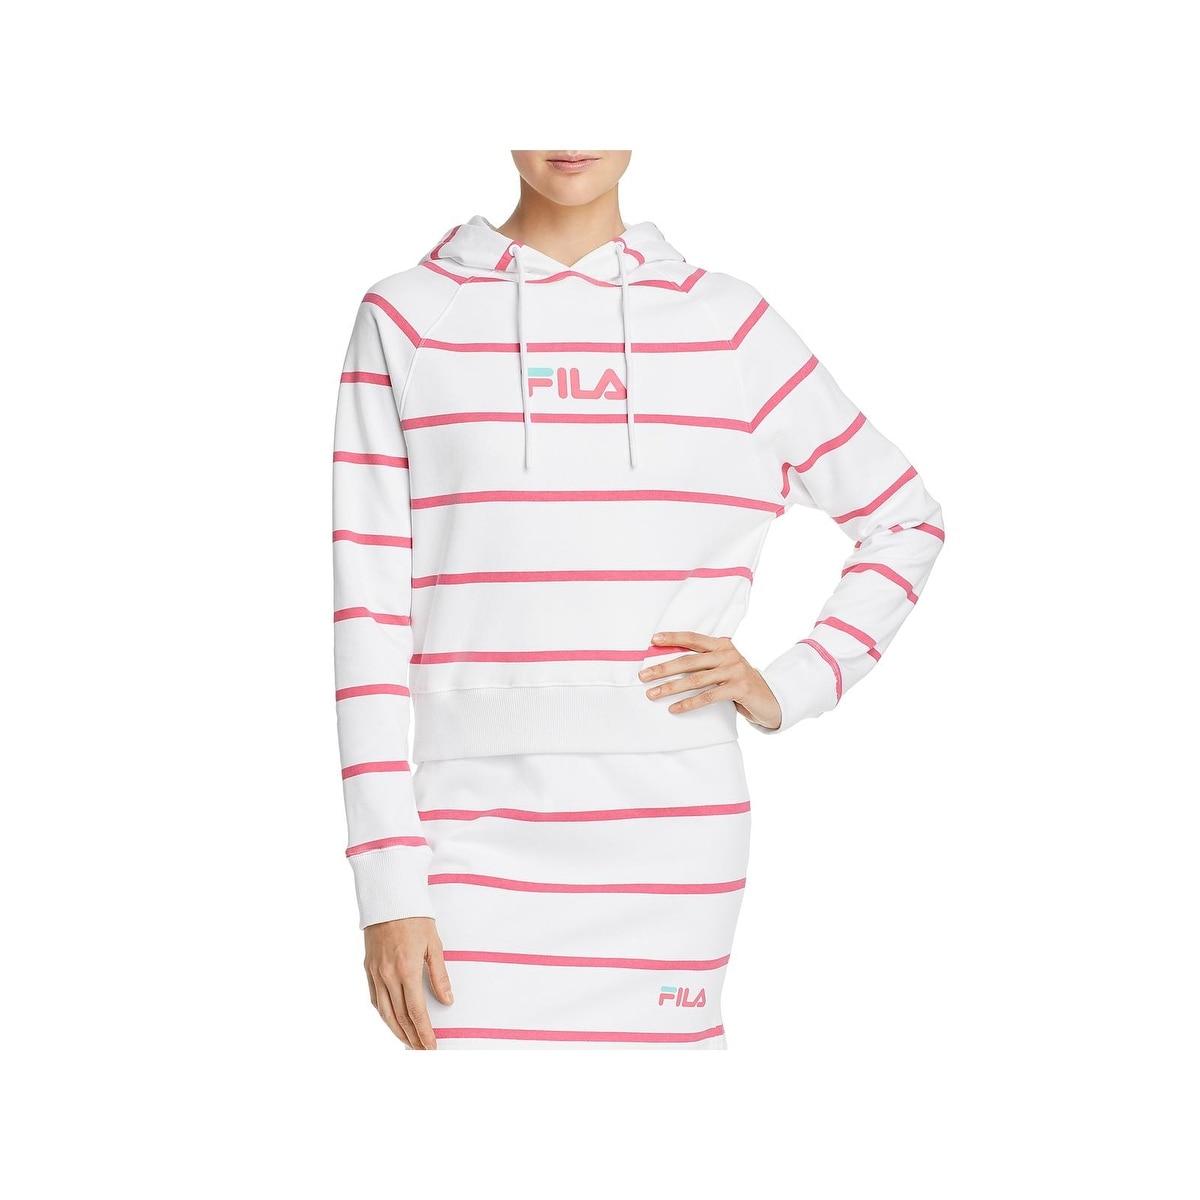 491ff2eebf57b Shop Fila Womens Hoodie Fitness Yoga - Free Shipping On Orders Over ...